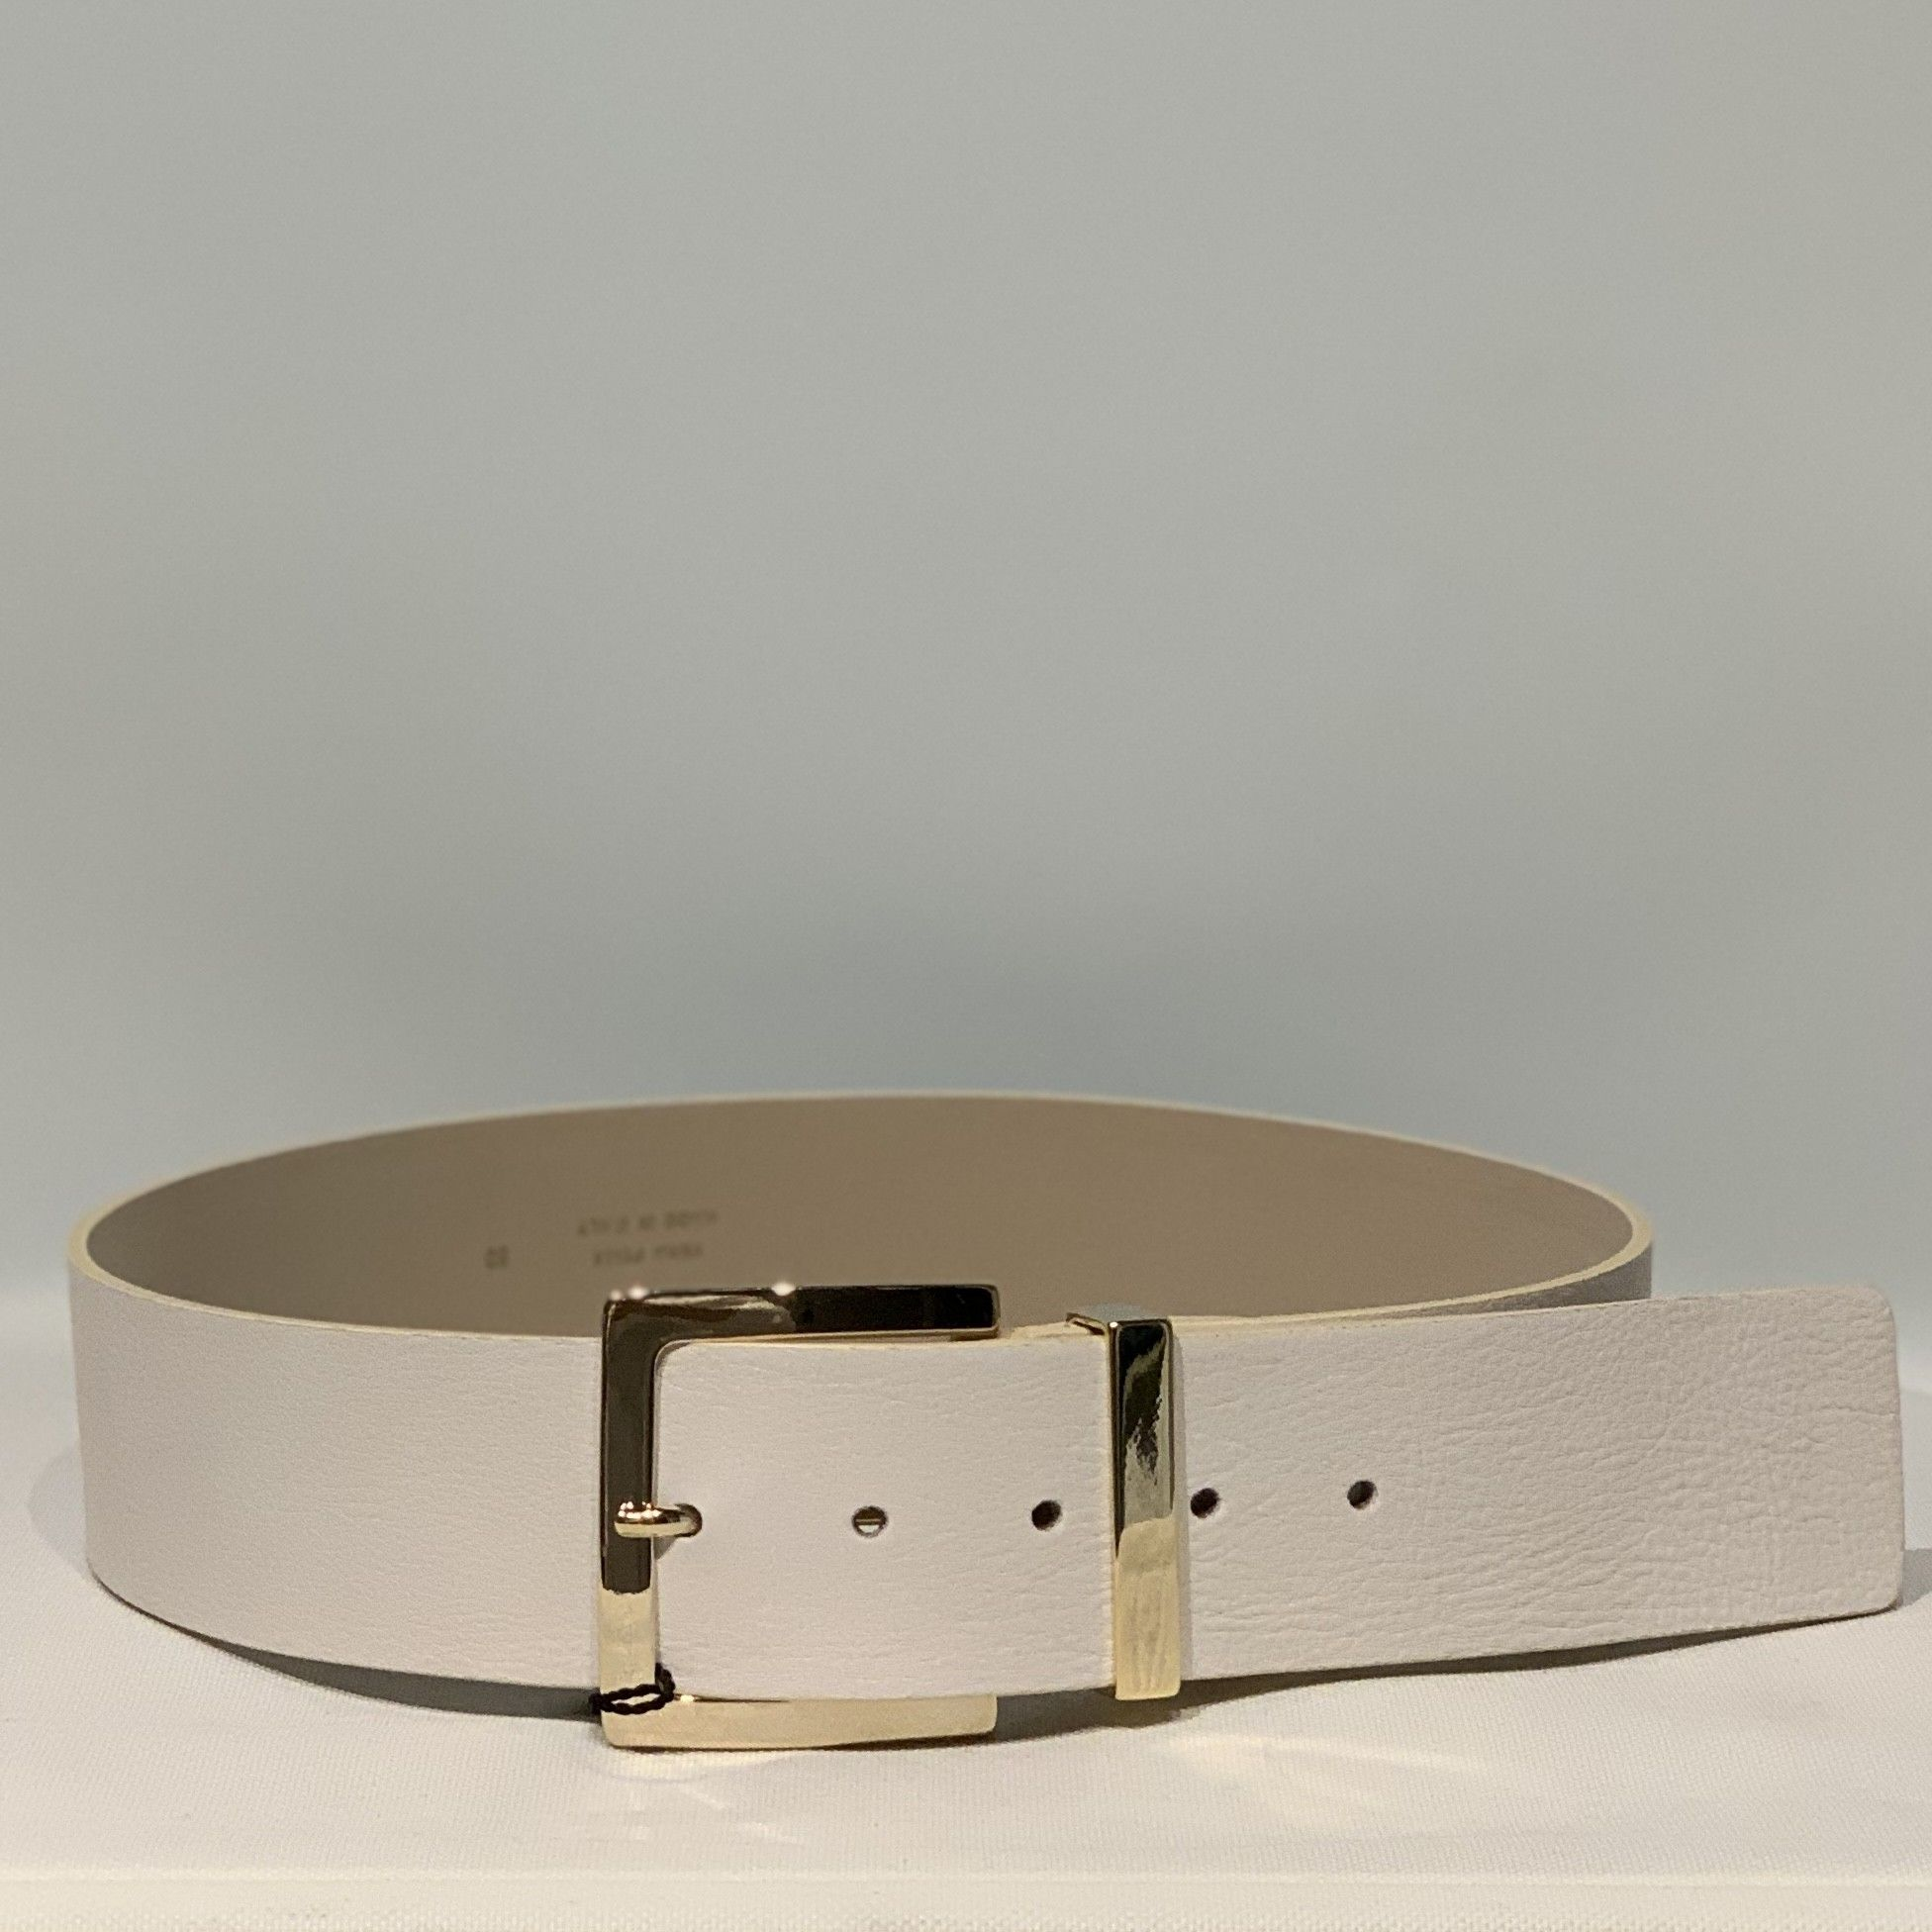 Cintura pelle panna PELLETTERIA G4